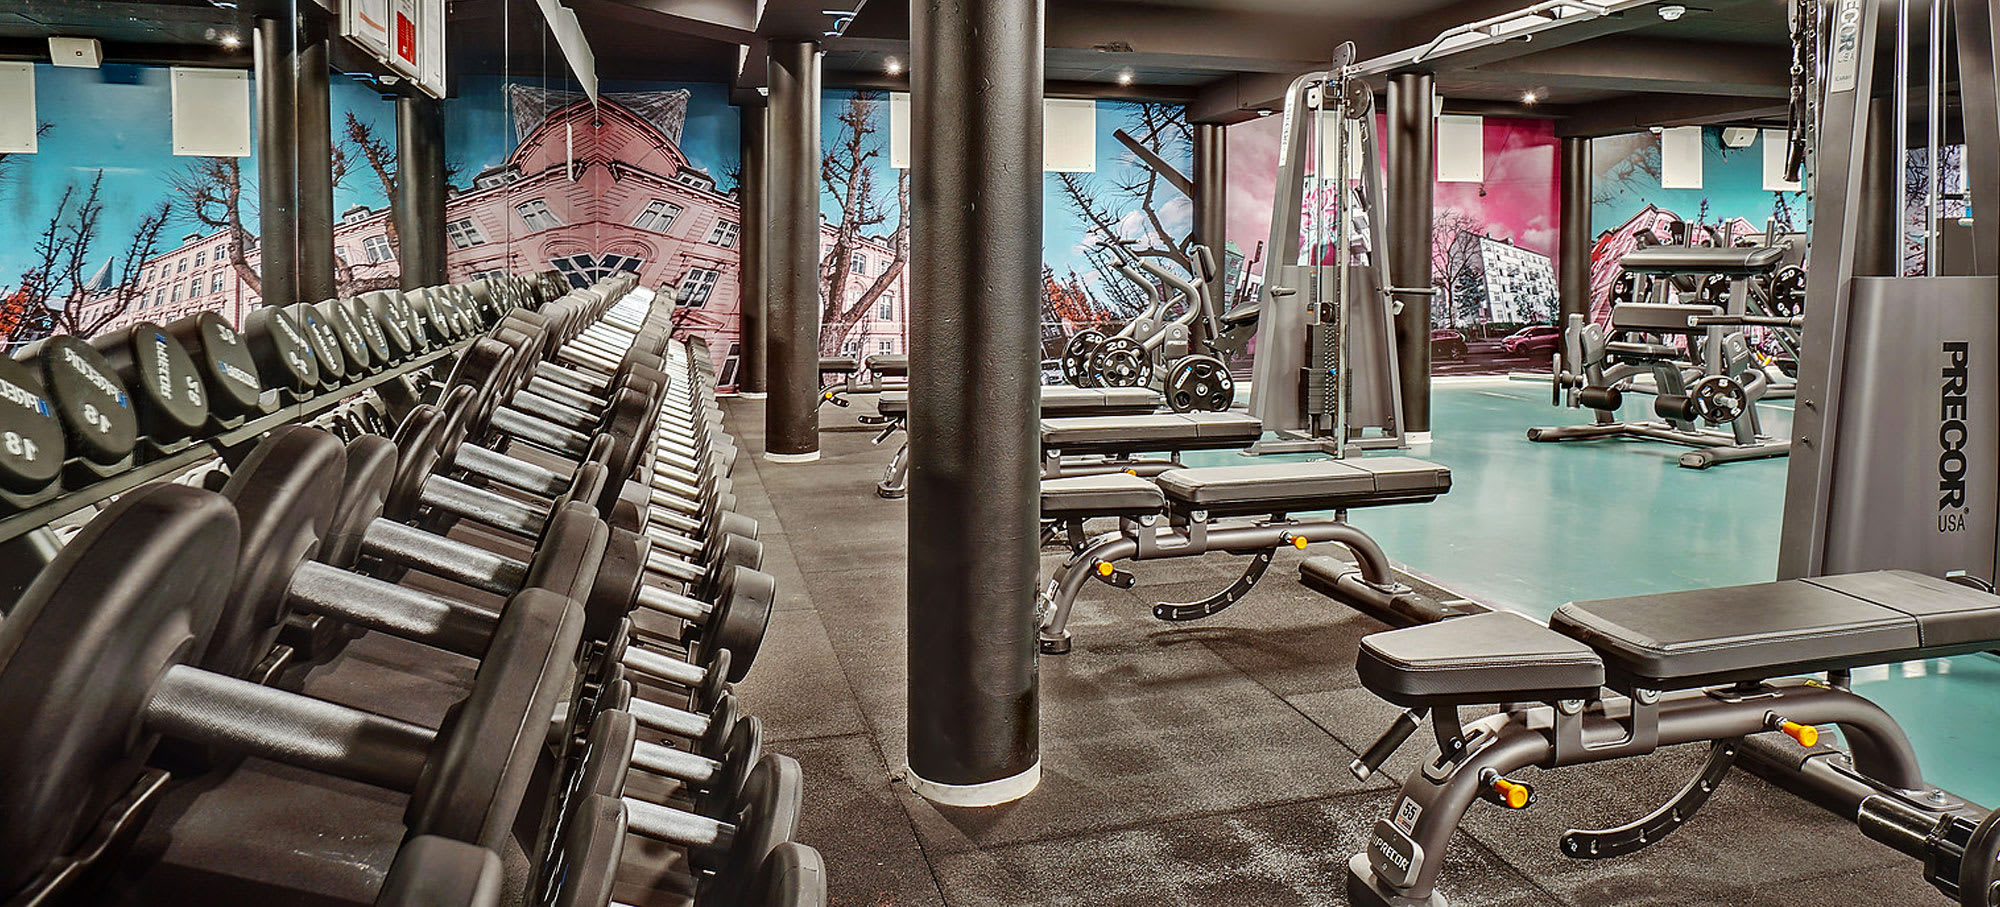 fitness dk døgnåbent